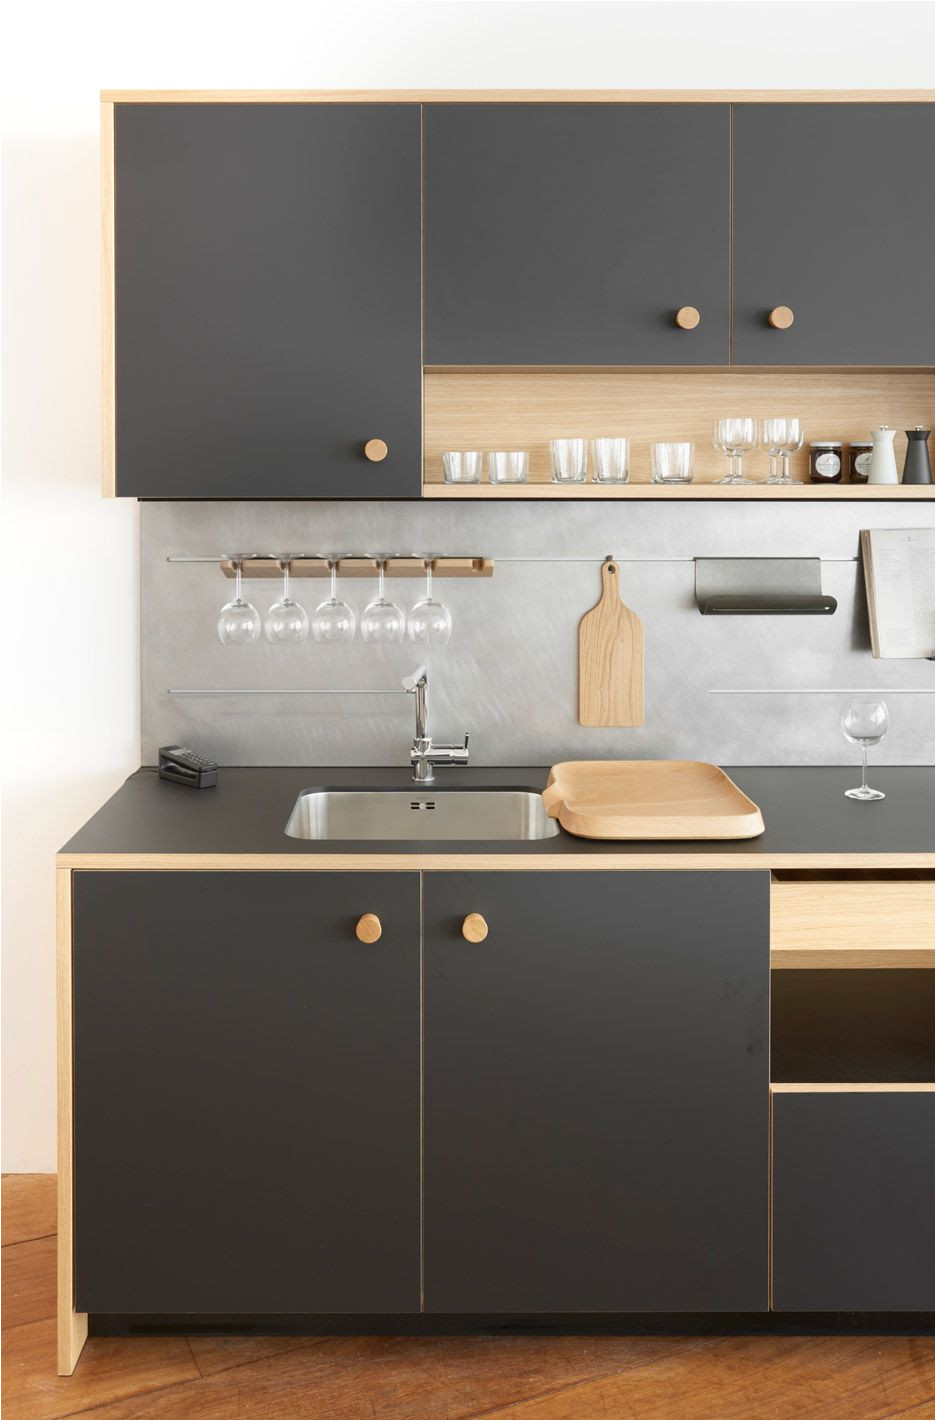 cocinas pequea as modernas impresionante galeria ideas para cocinas integrales pequeas image gallery ideas para